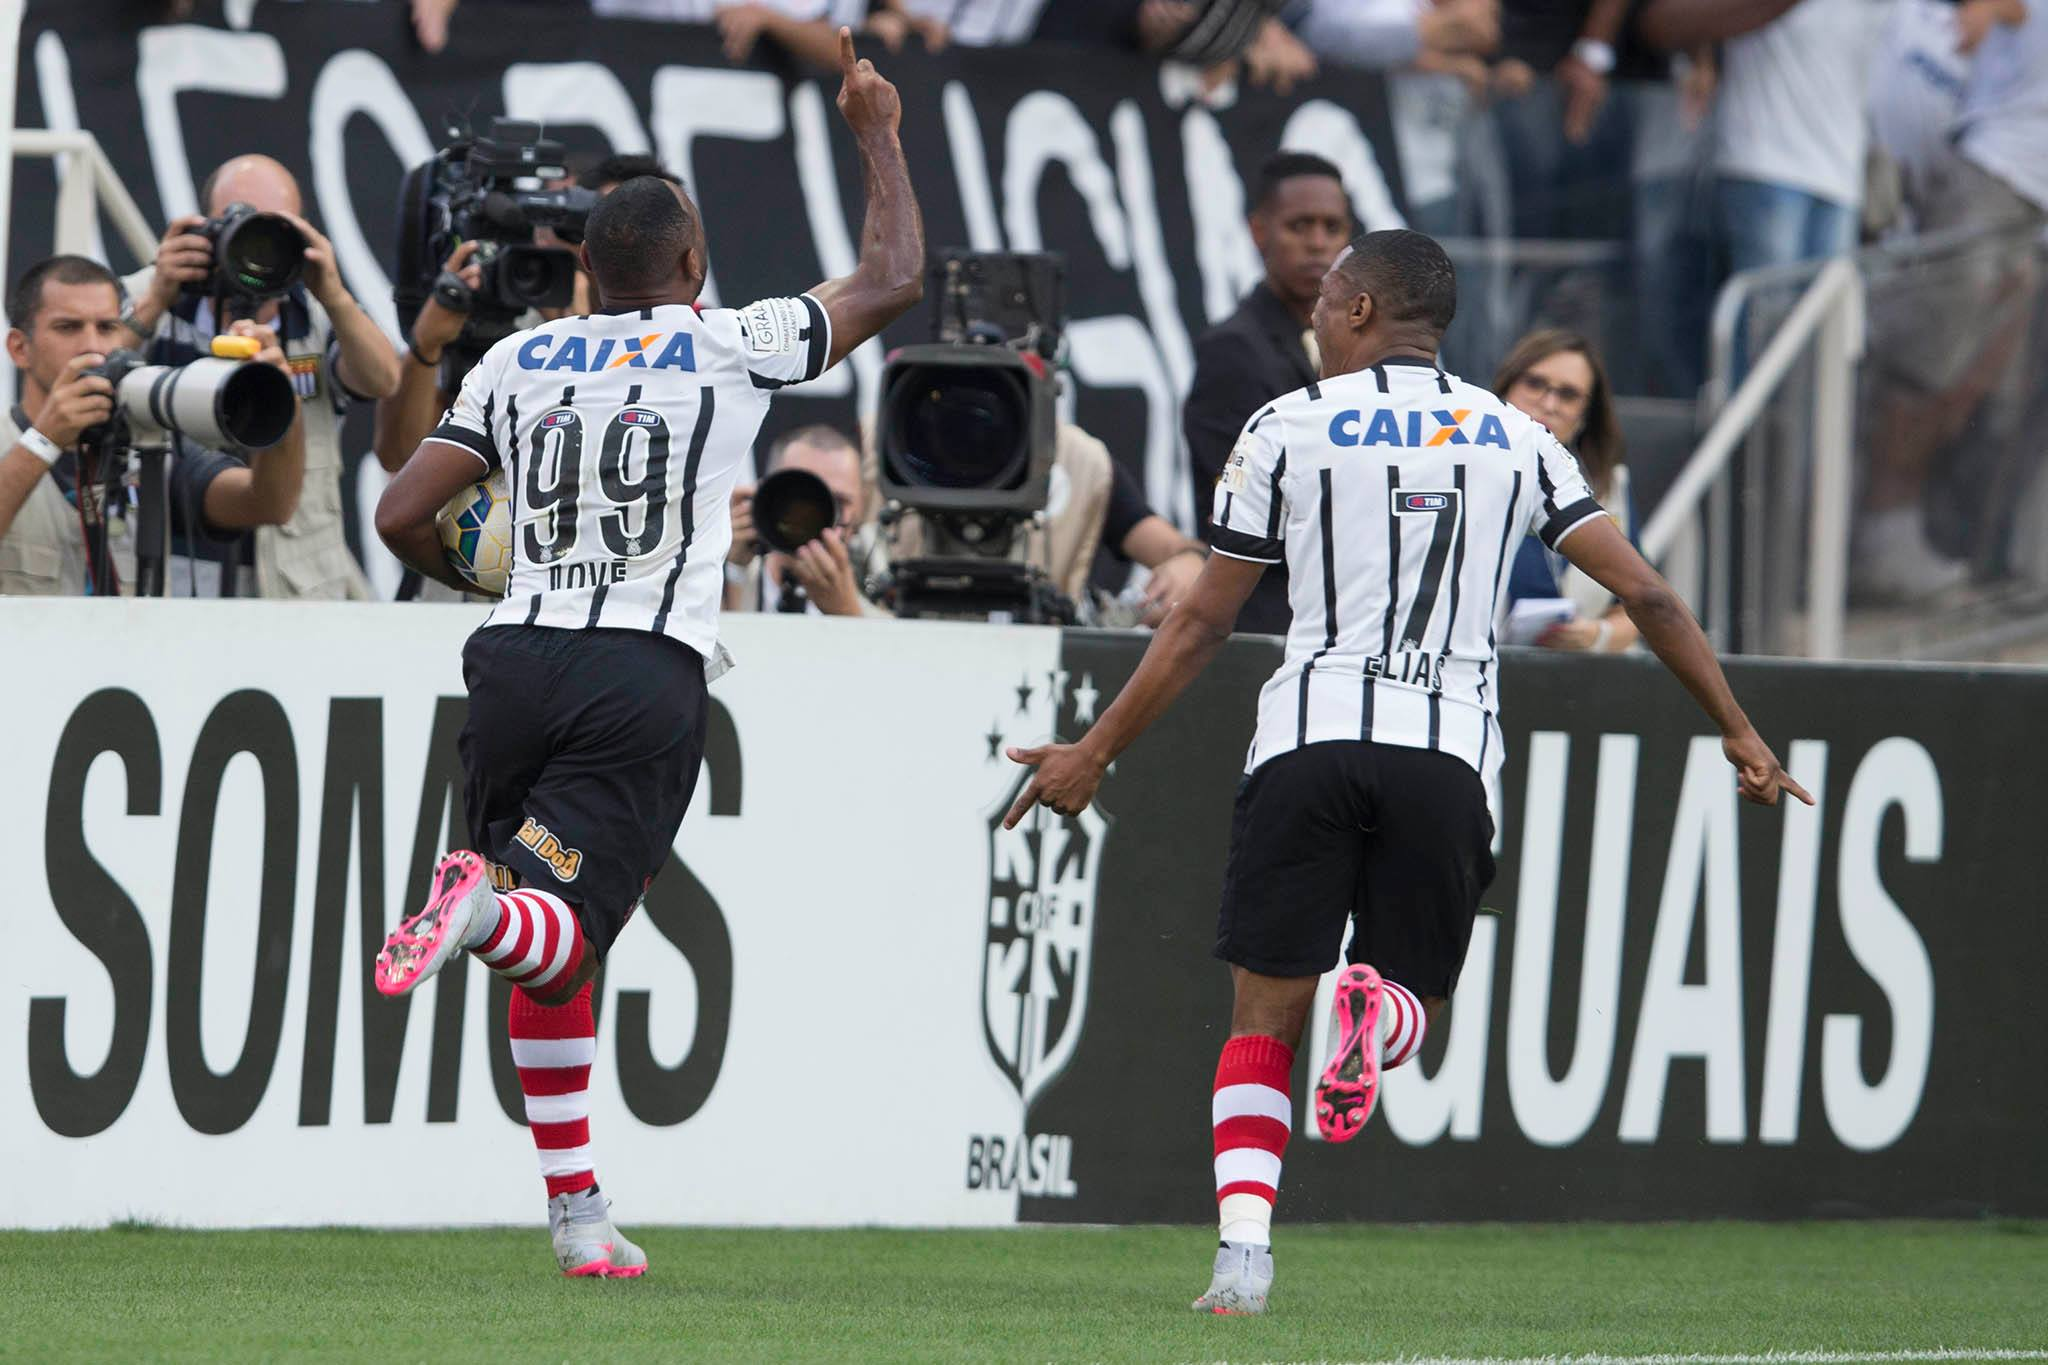 VÍDEO: Corinthians 3 x 0 Cruzeiro